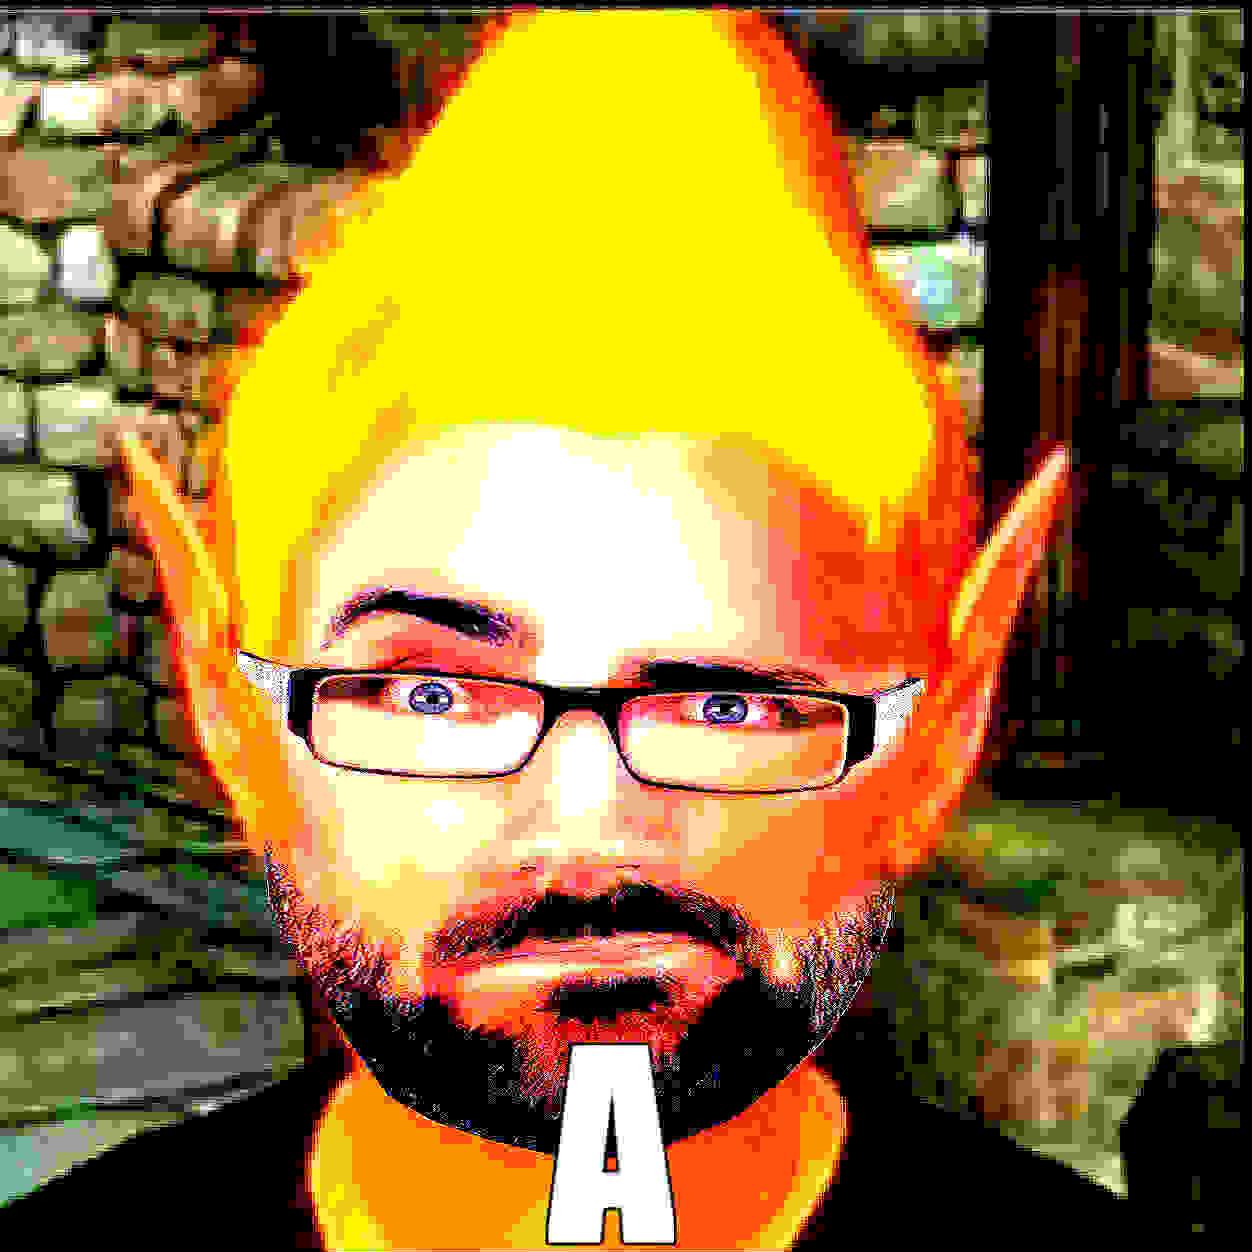 A   Lord Farquaad / Markiplier E   Know Your Meme Markiplier E